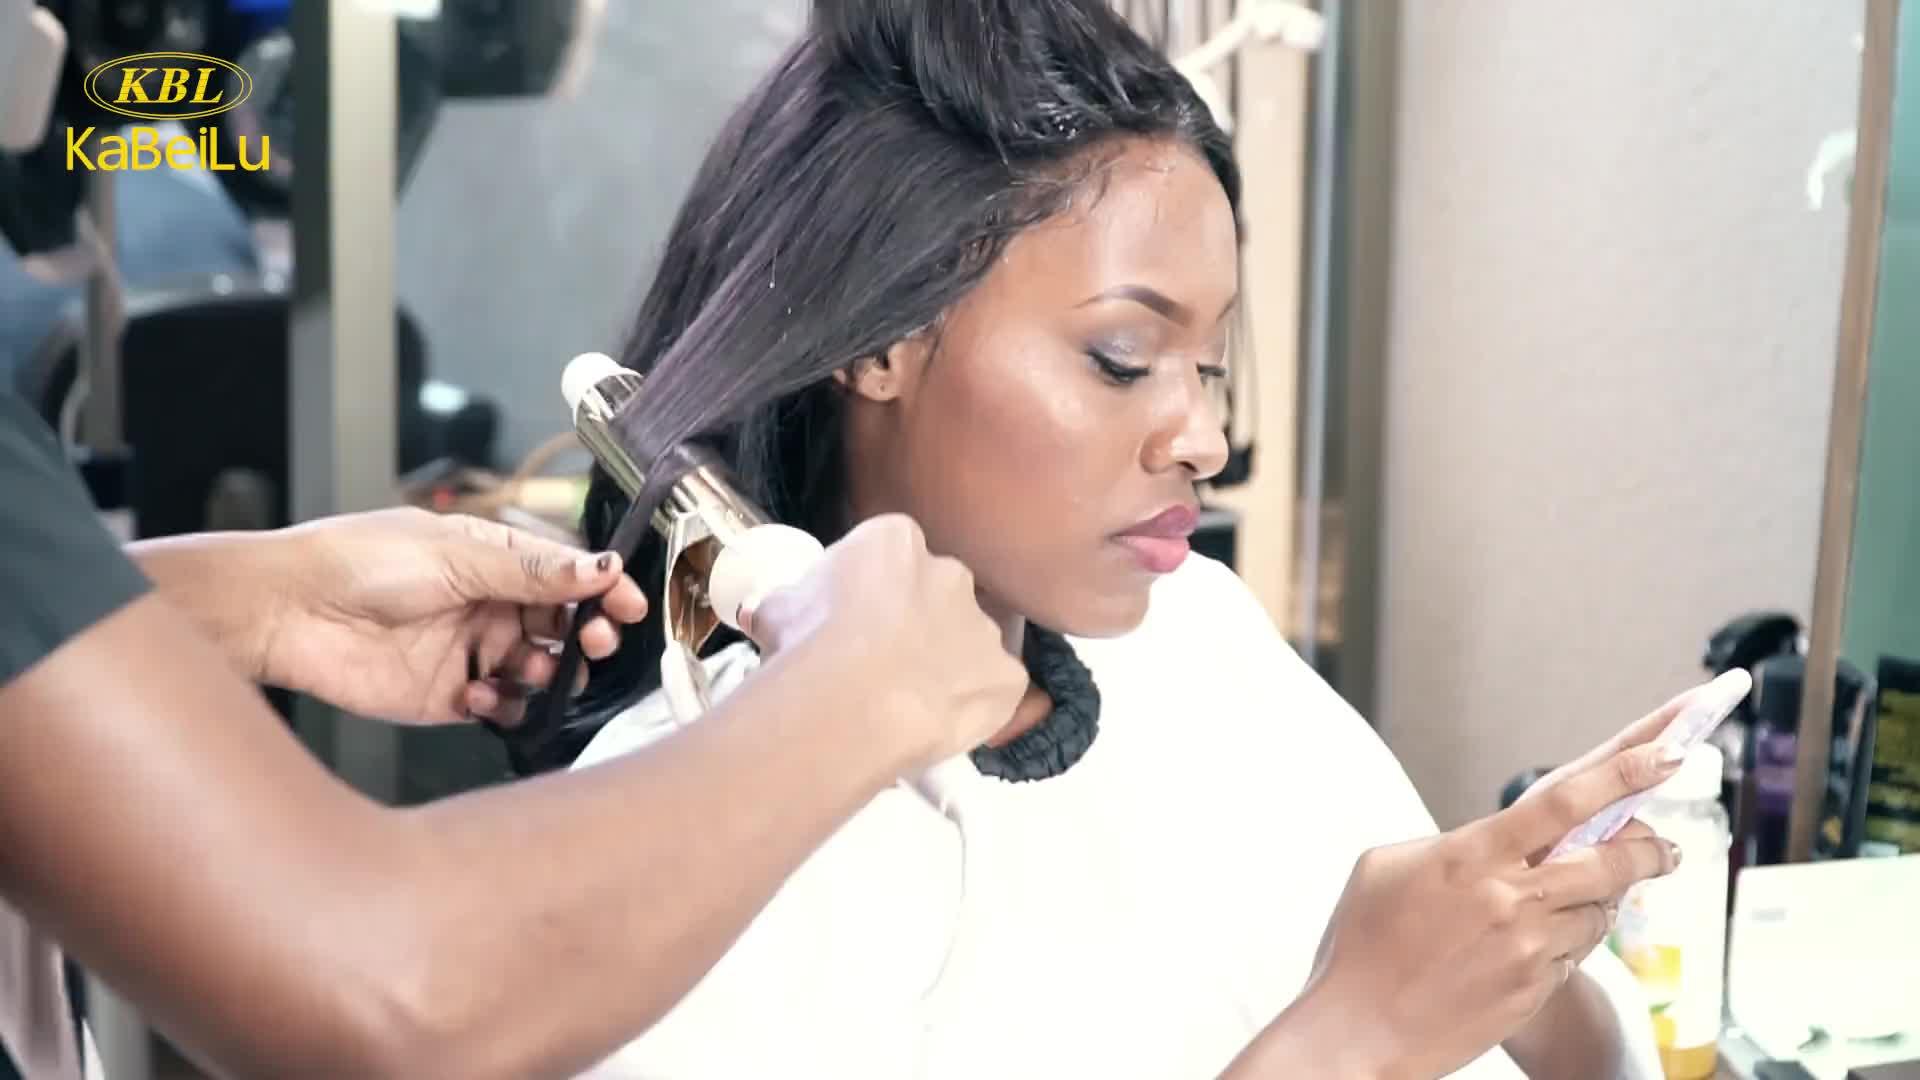 KBL गुआंगज़ौ प्राकृतिक ब्राजील रेमी मानव बाल निर्माता, 10 inch ब्राजील के बाल एक्सटेंशन, रेमी बाल 8a ग्रेड ब्राजील के बालों